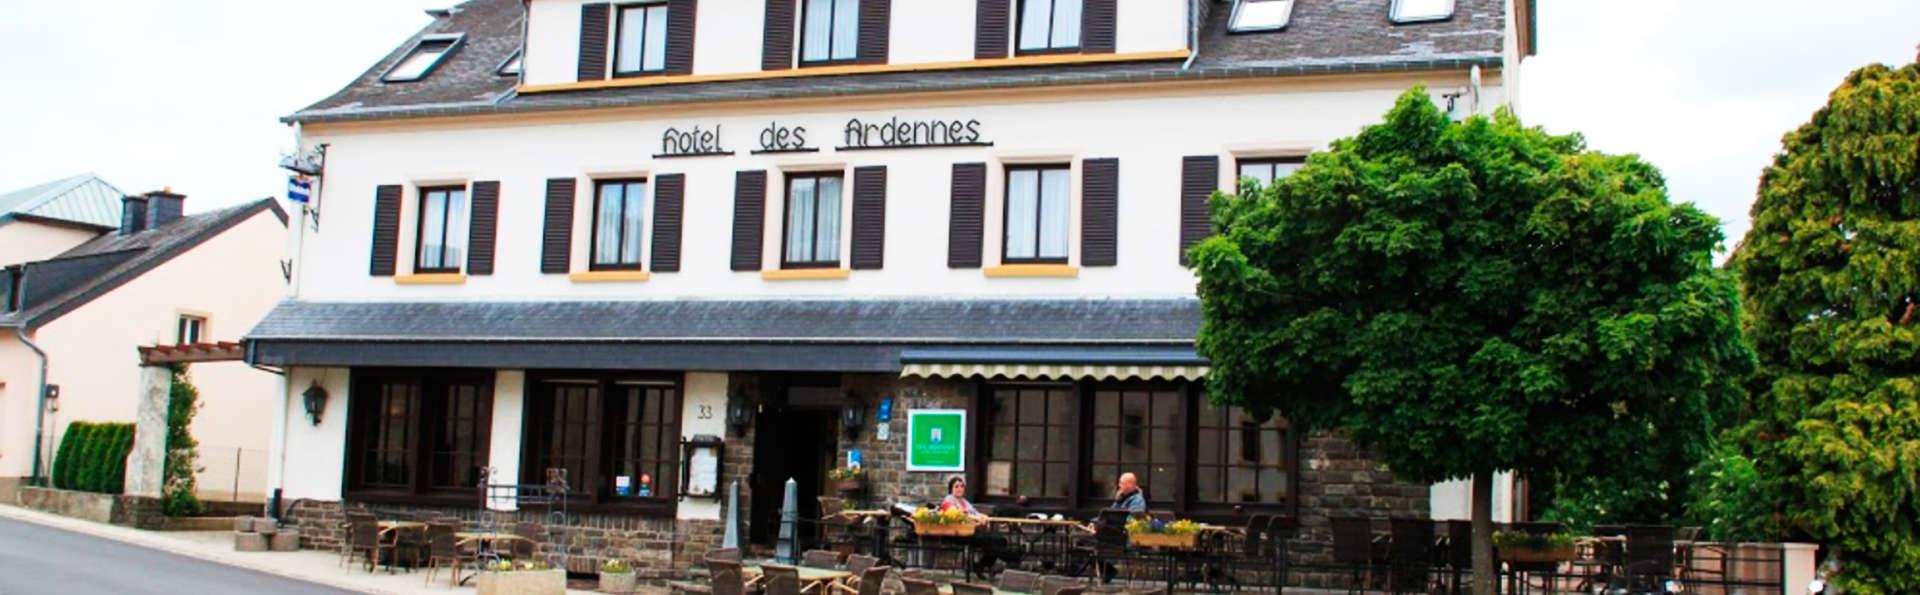 Hotel Des Ardennes - EDIT_front1.jpg